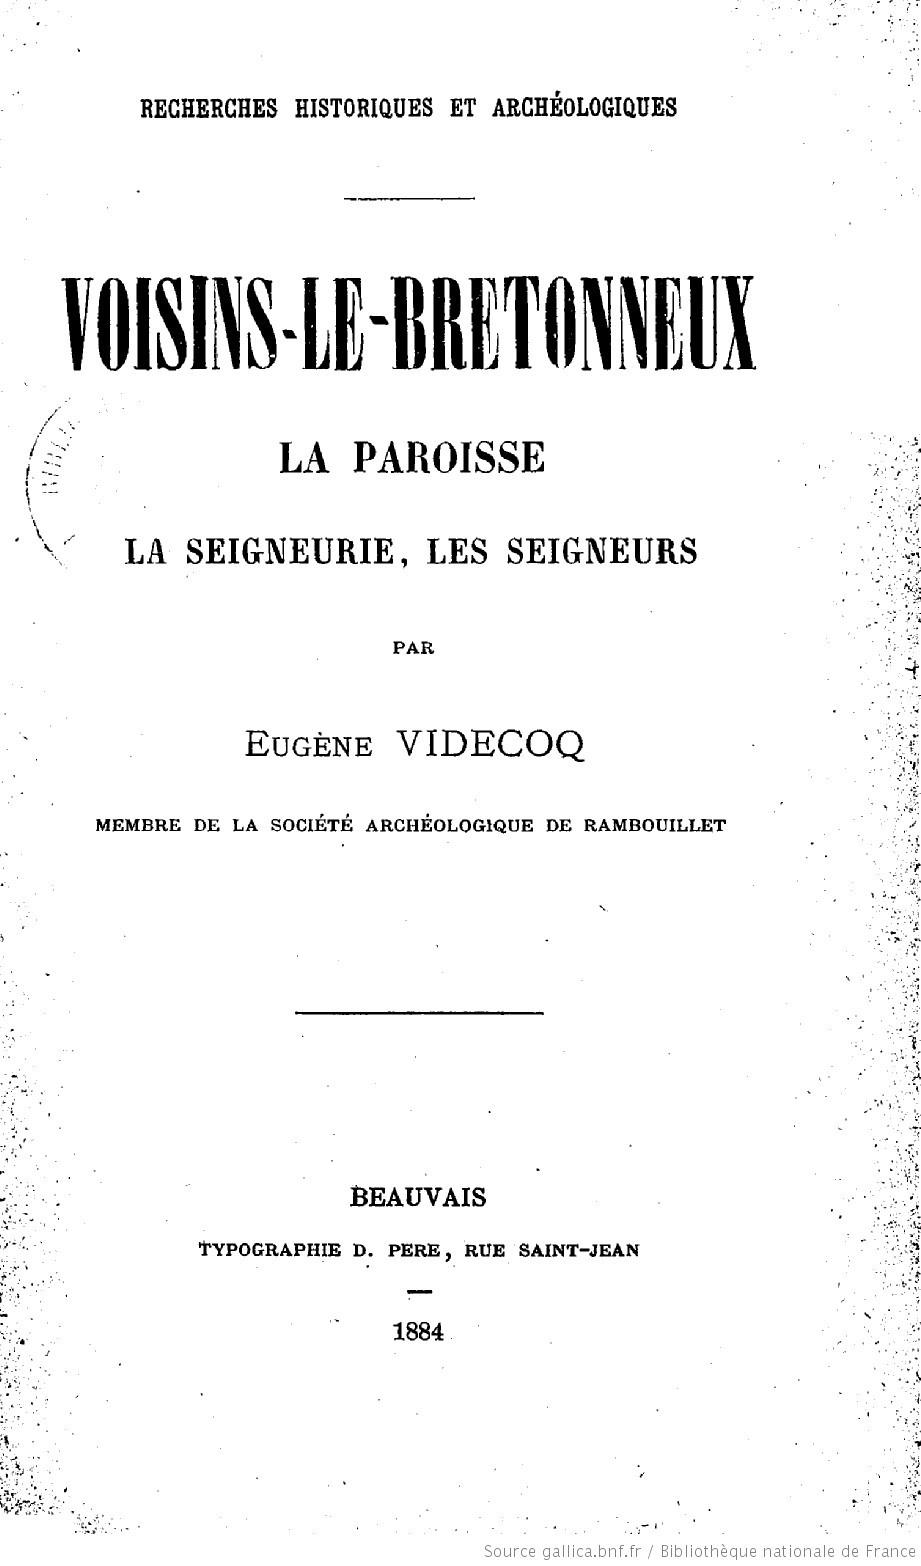 http://gallica.bnf.fr/ark:/12148/bpt6k379350d.thumbnail.highres.jpg